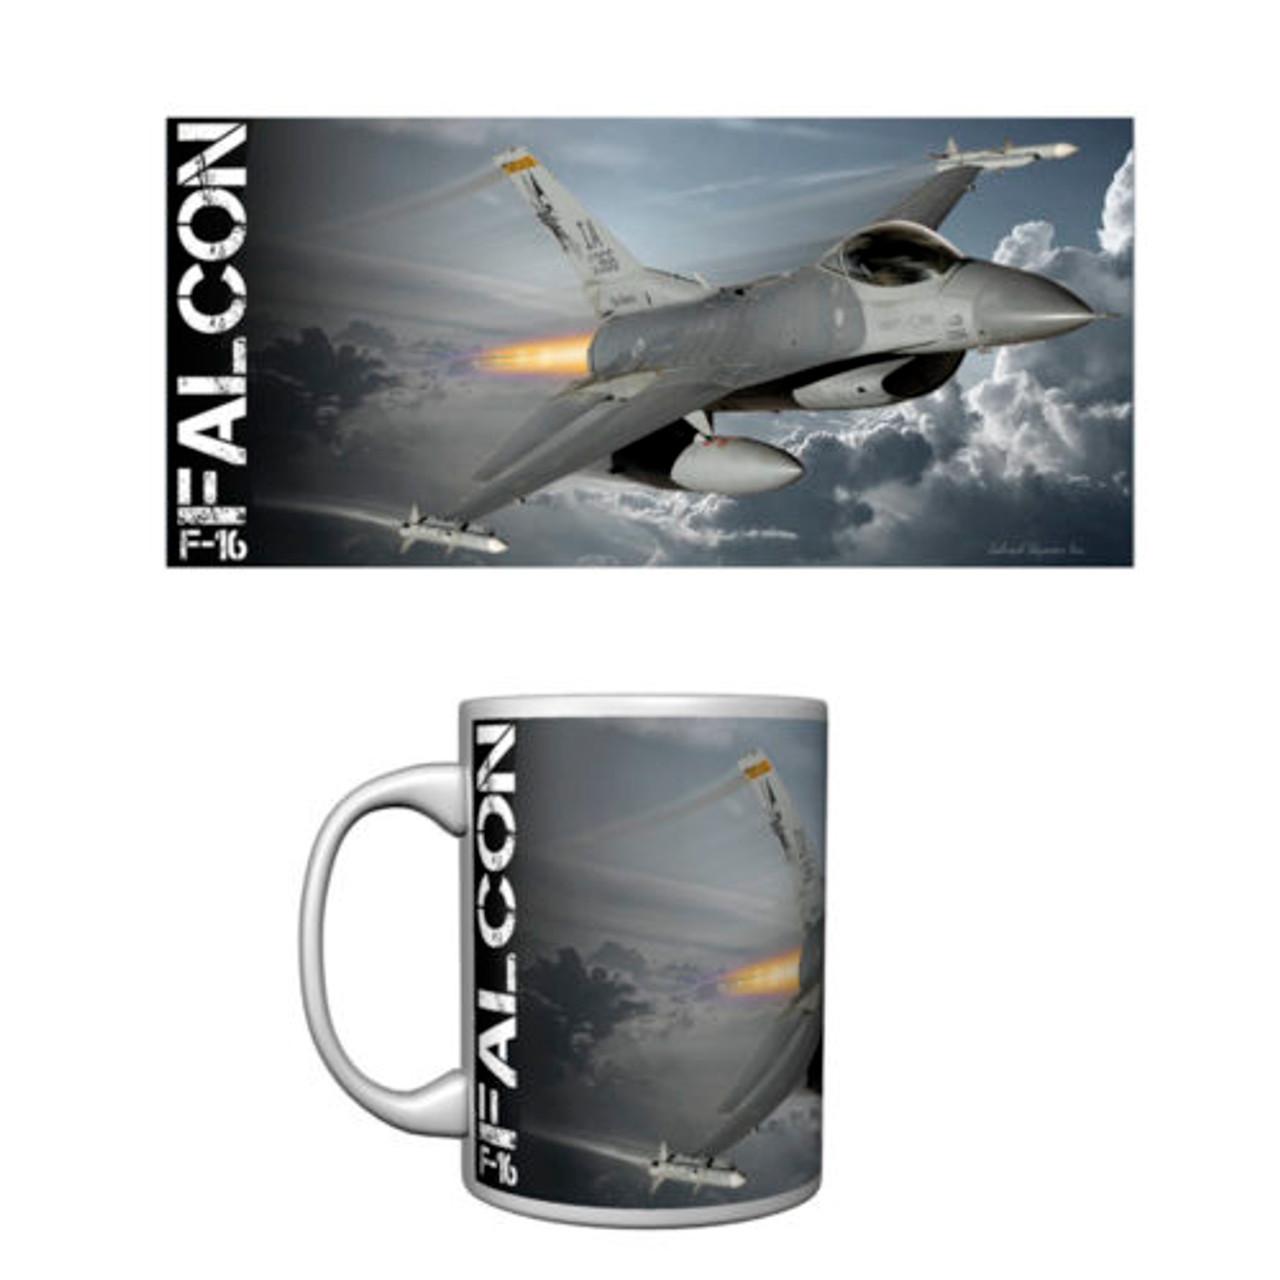 F-16 Falcon Ceramic Mug